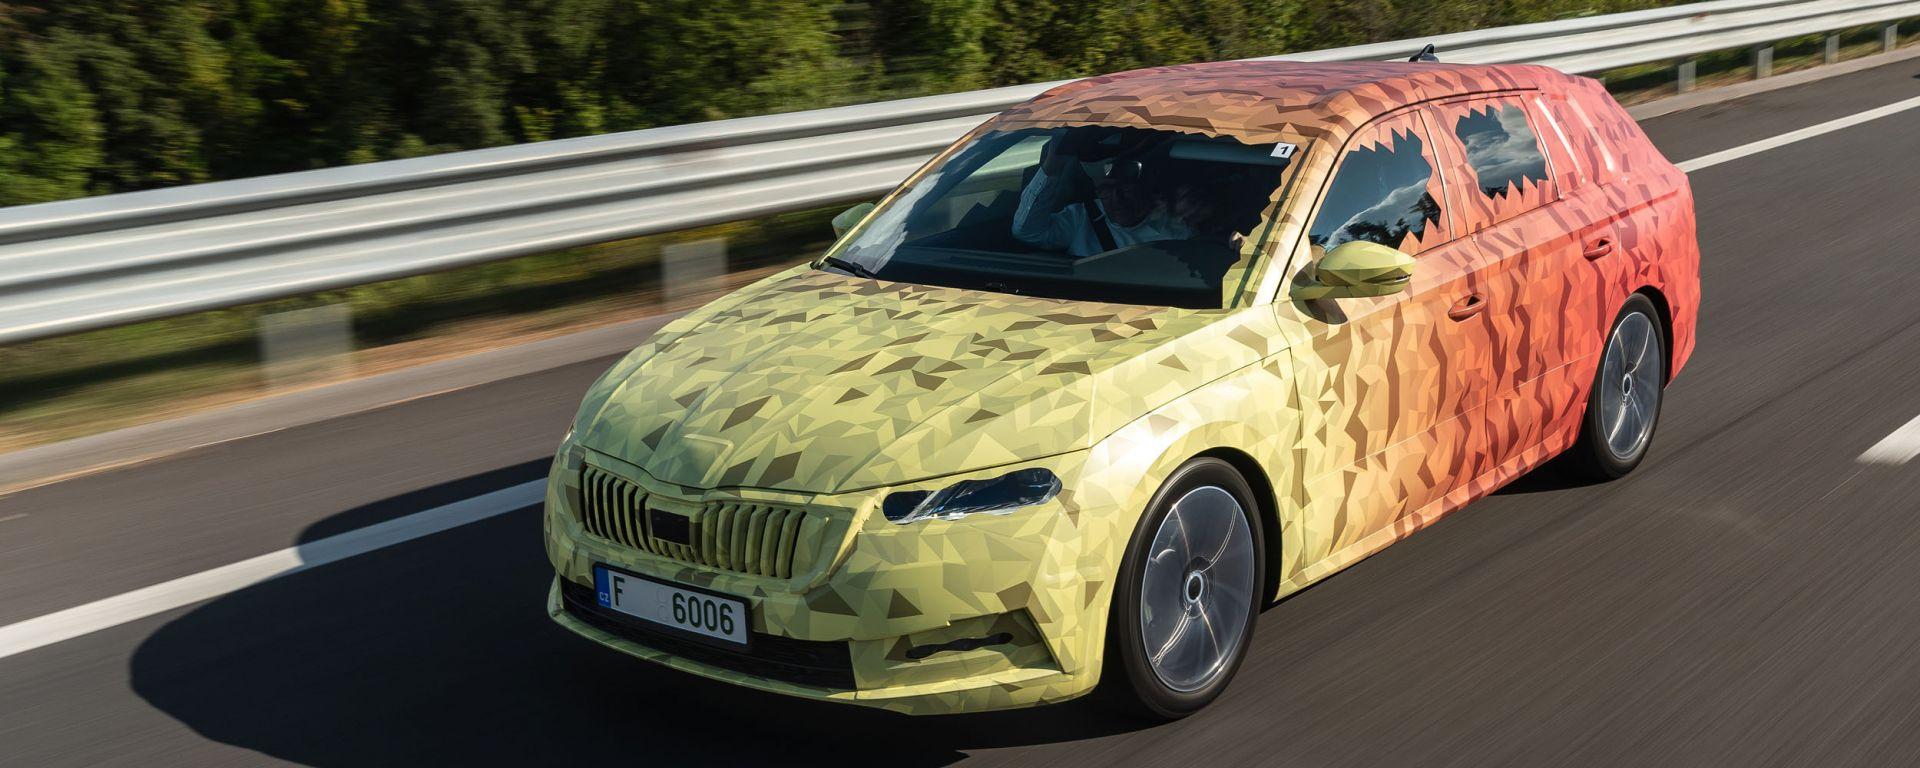 Nuova Skoda Octavia 2020: vista di 3/4 anteriore